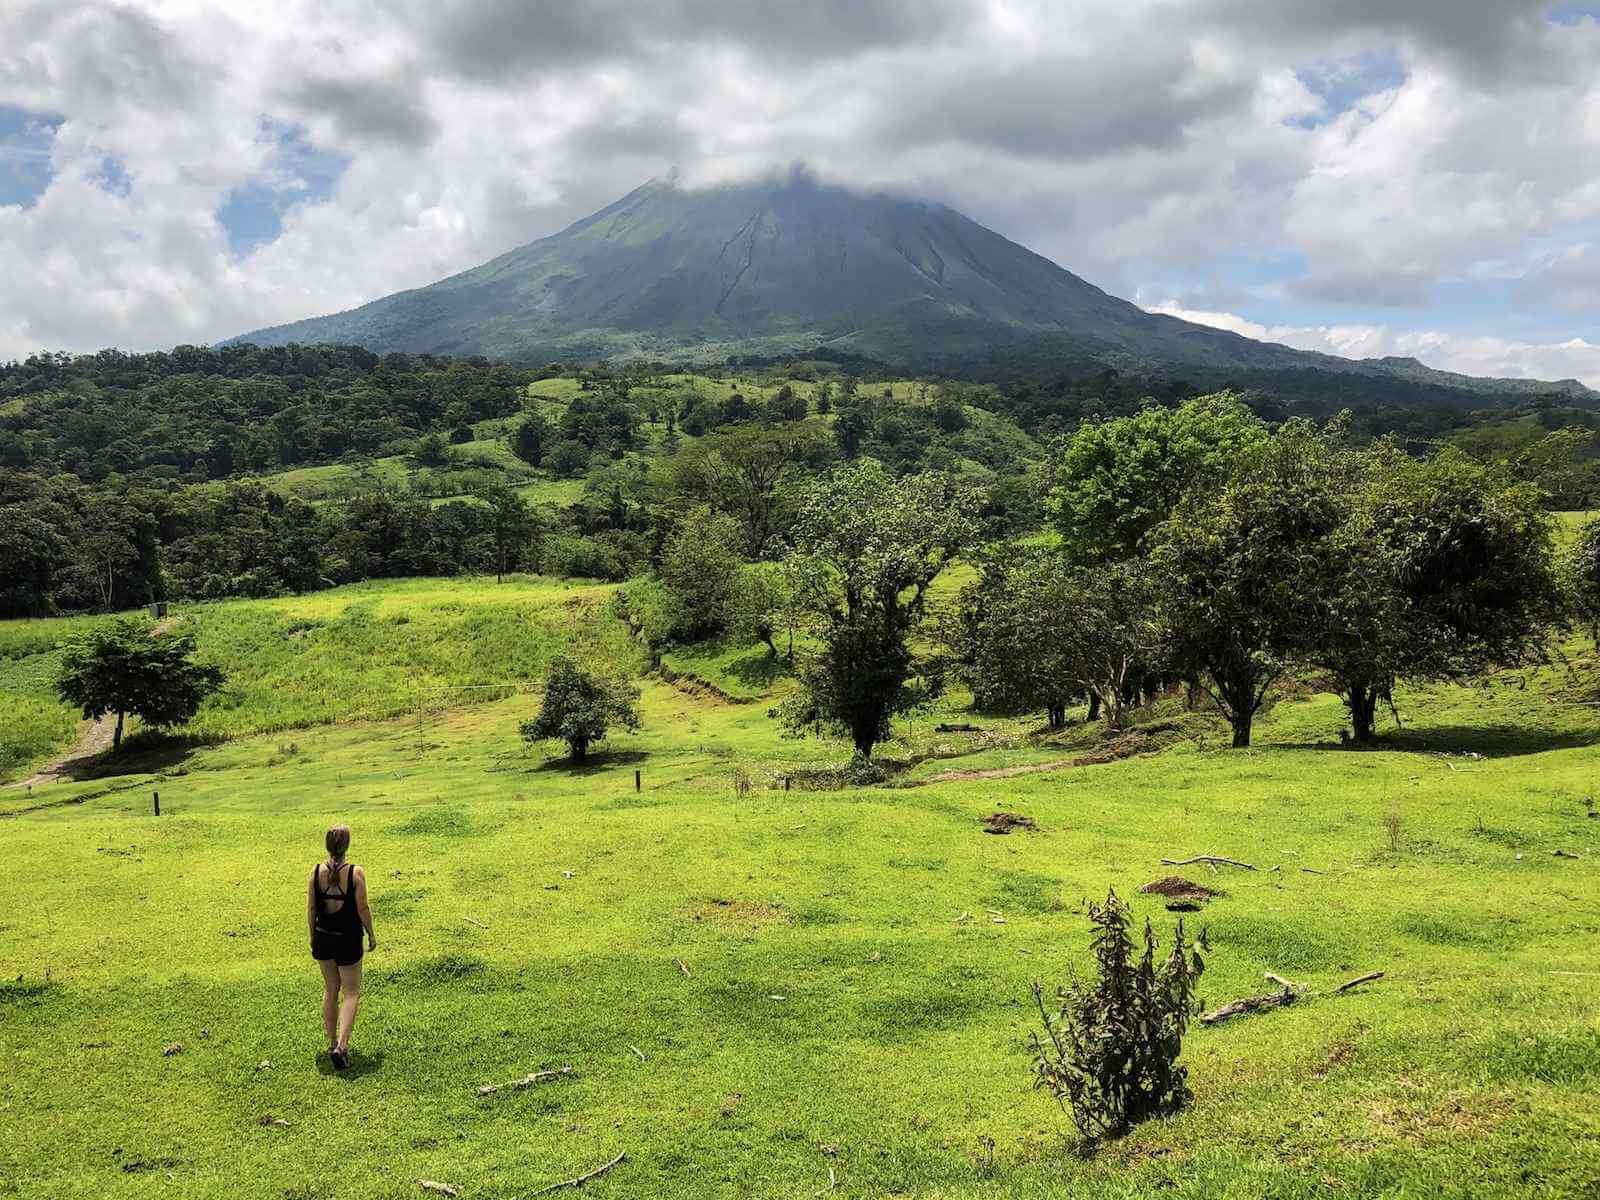 Arenal / La Fortuna - vulkaan & wildlife